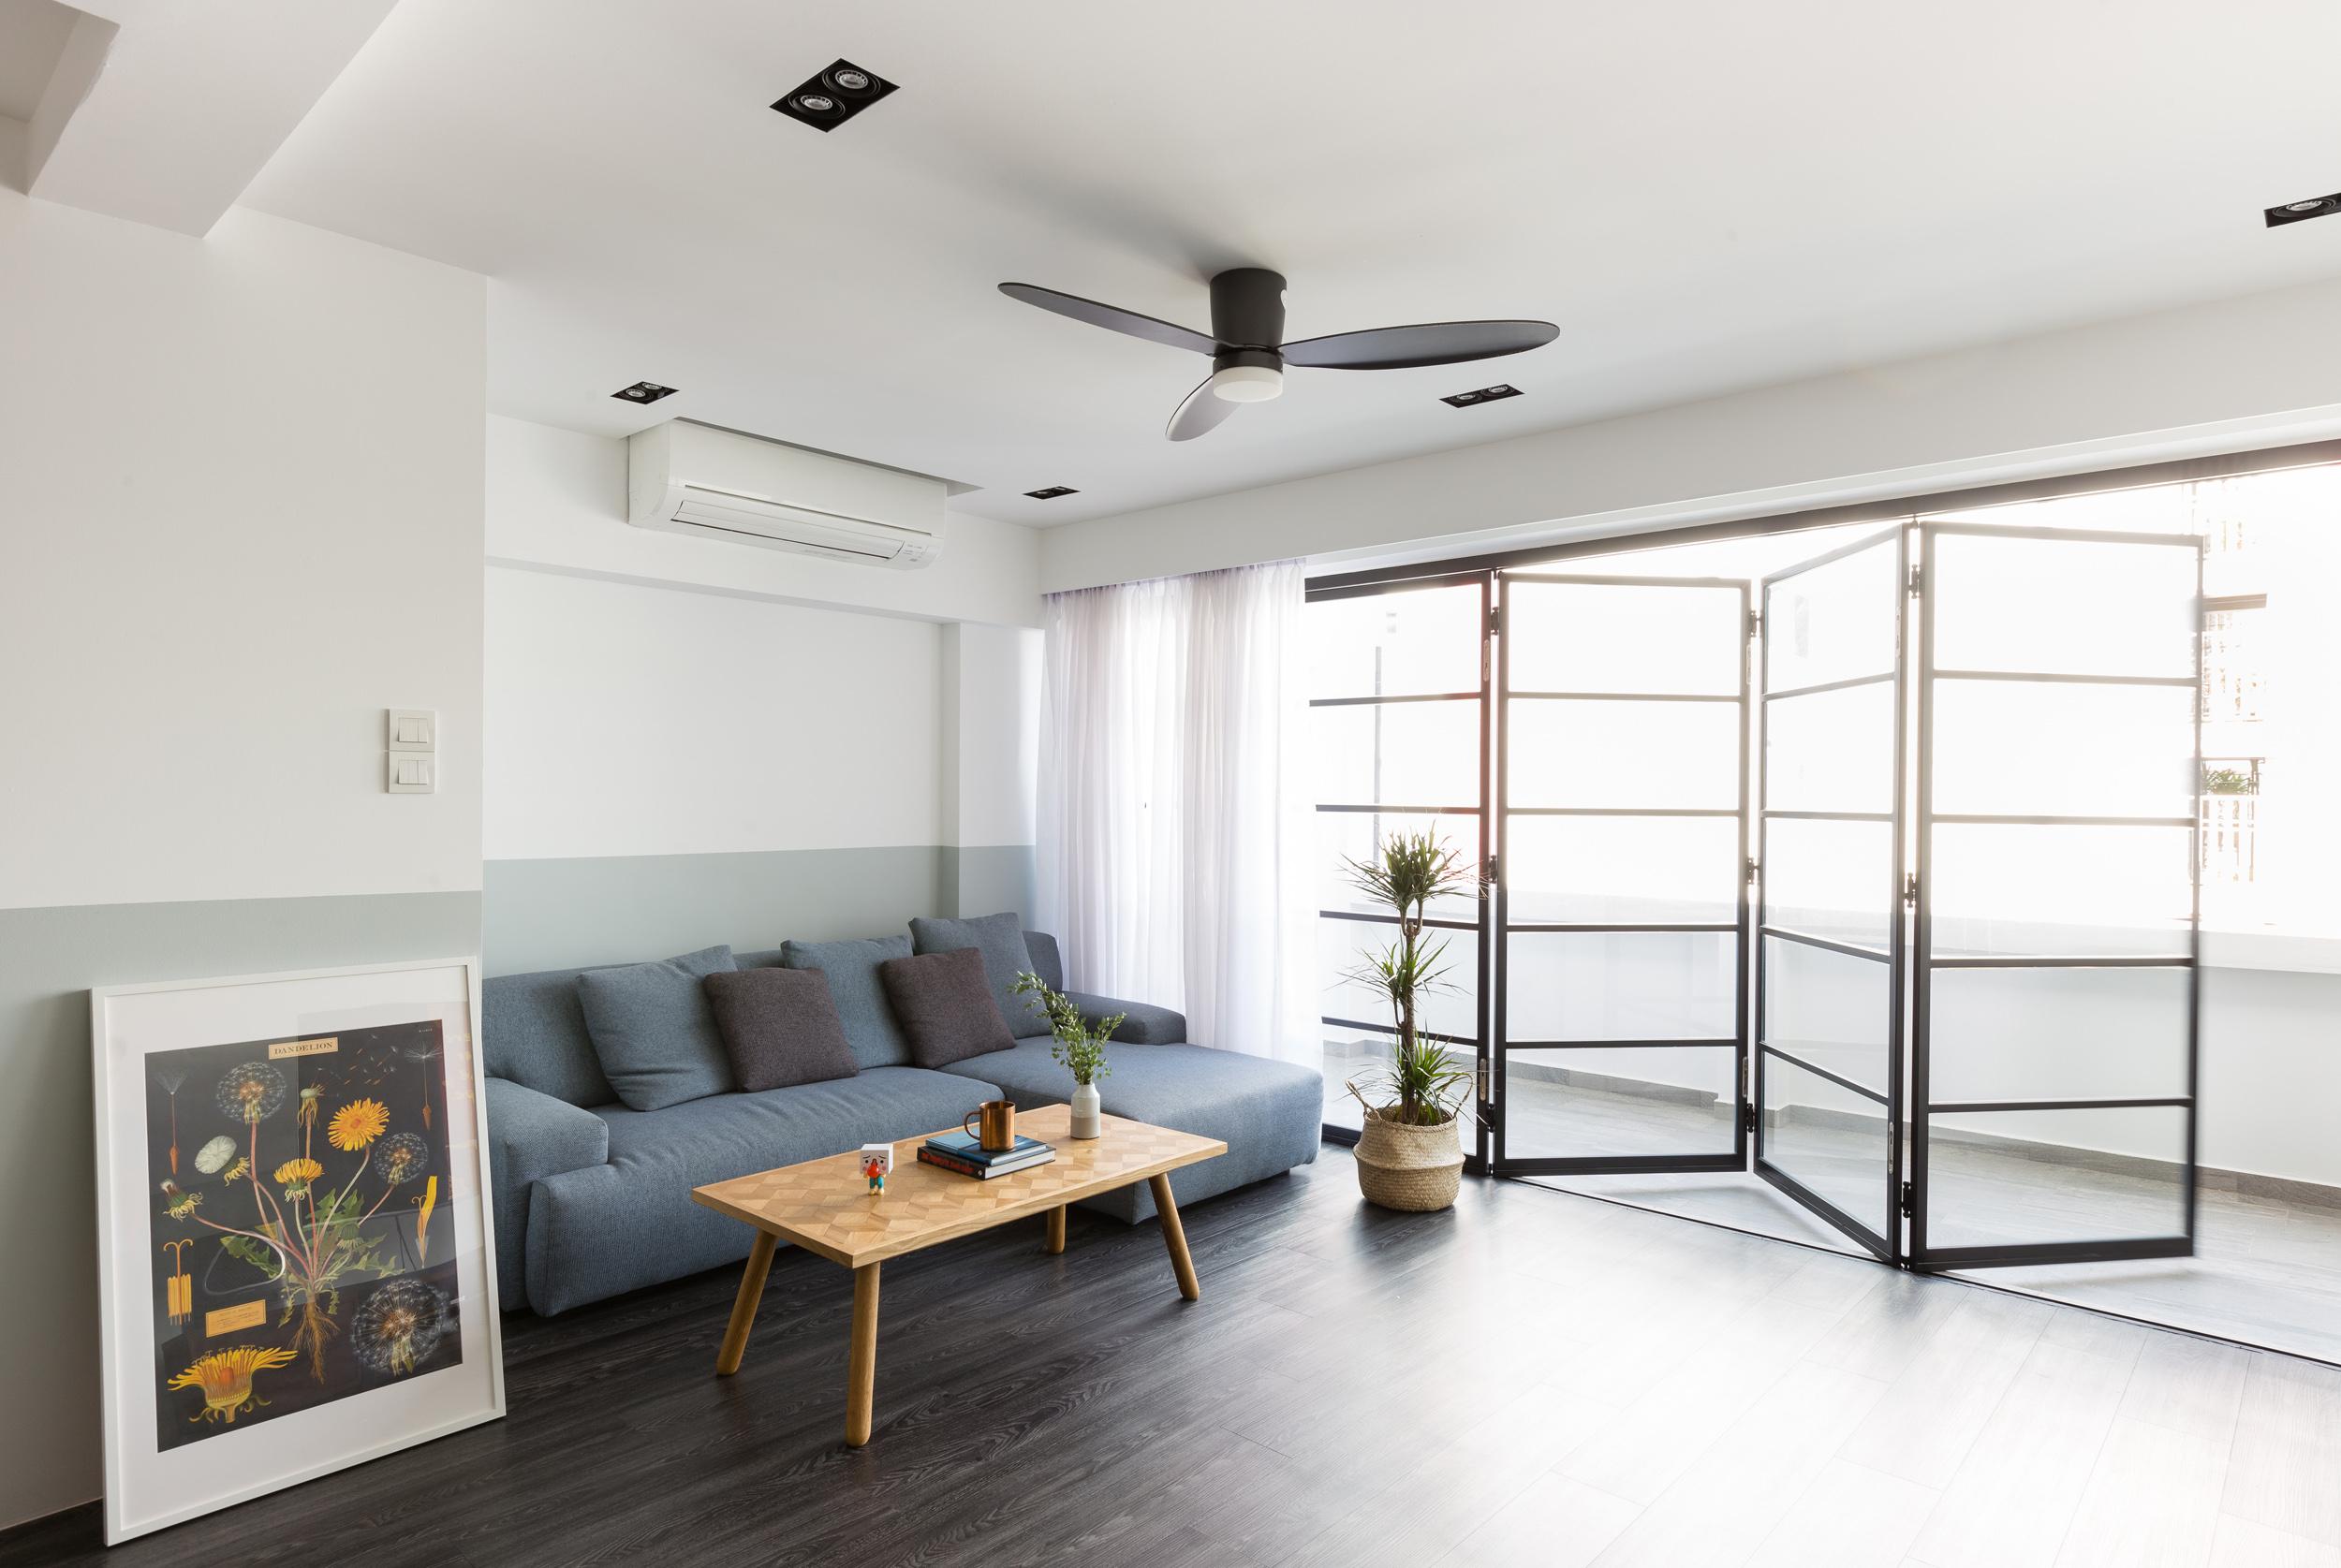 singapore-interiors-photographer-zainal-zainal-studio-13.jpg